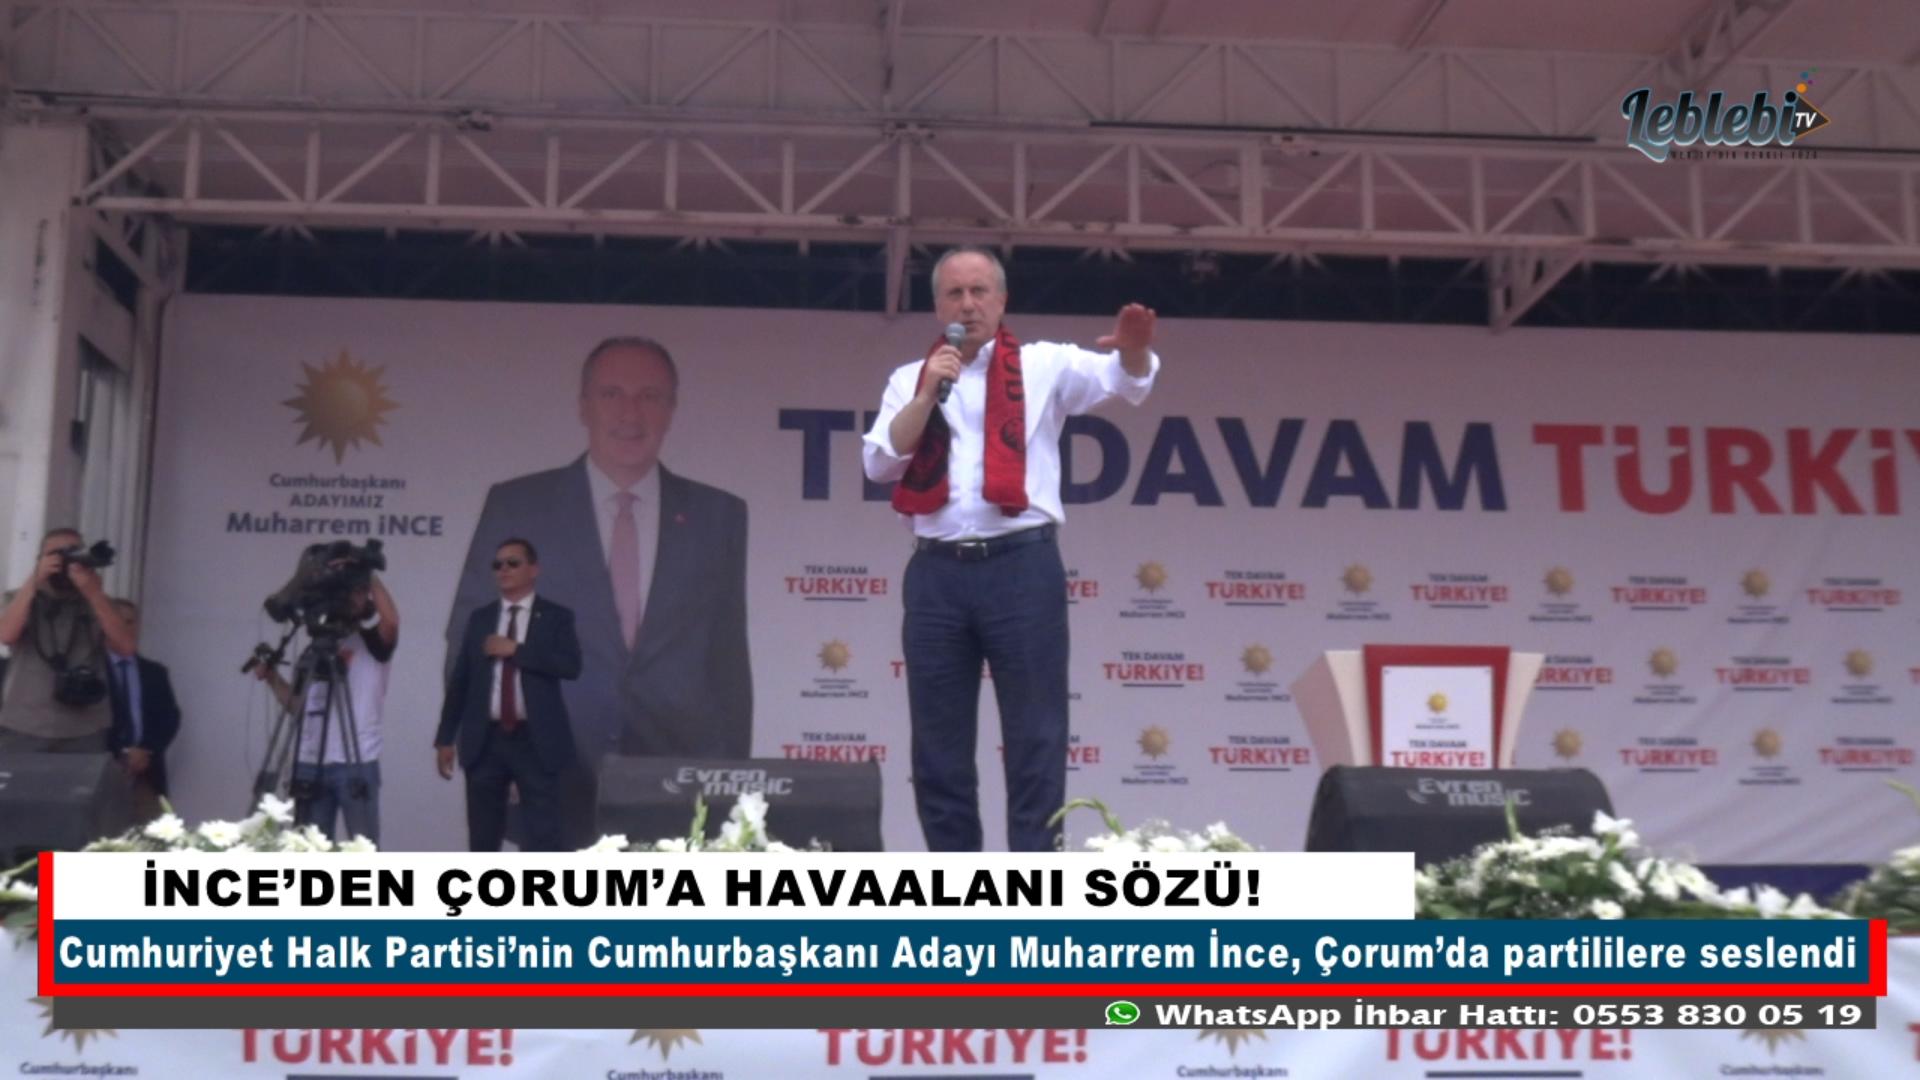 İNCE'DEN ÇORUM'A HAVAALANI SÖZÜ!